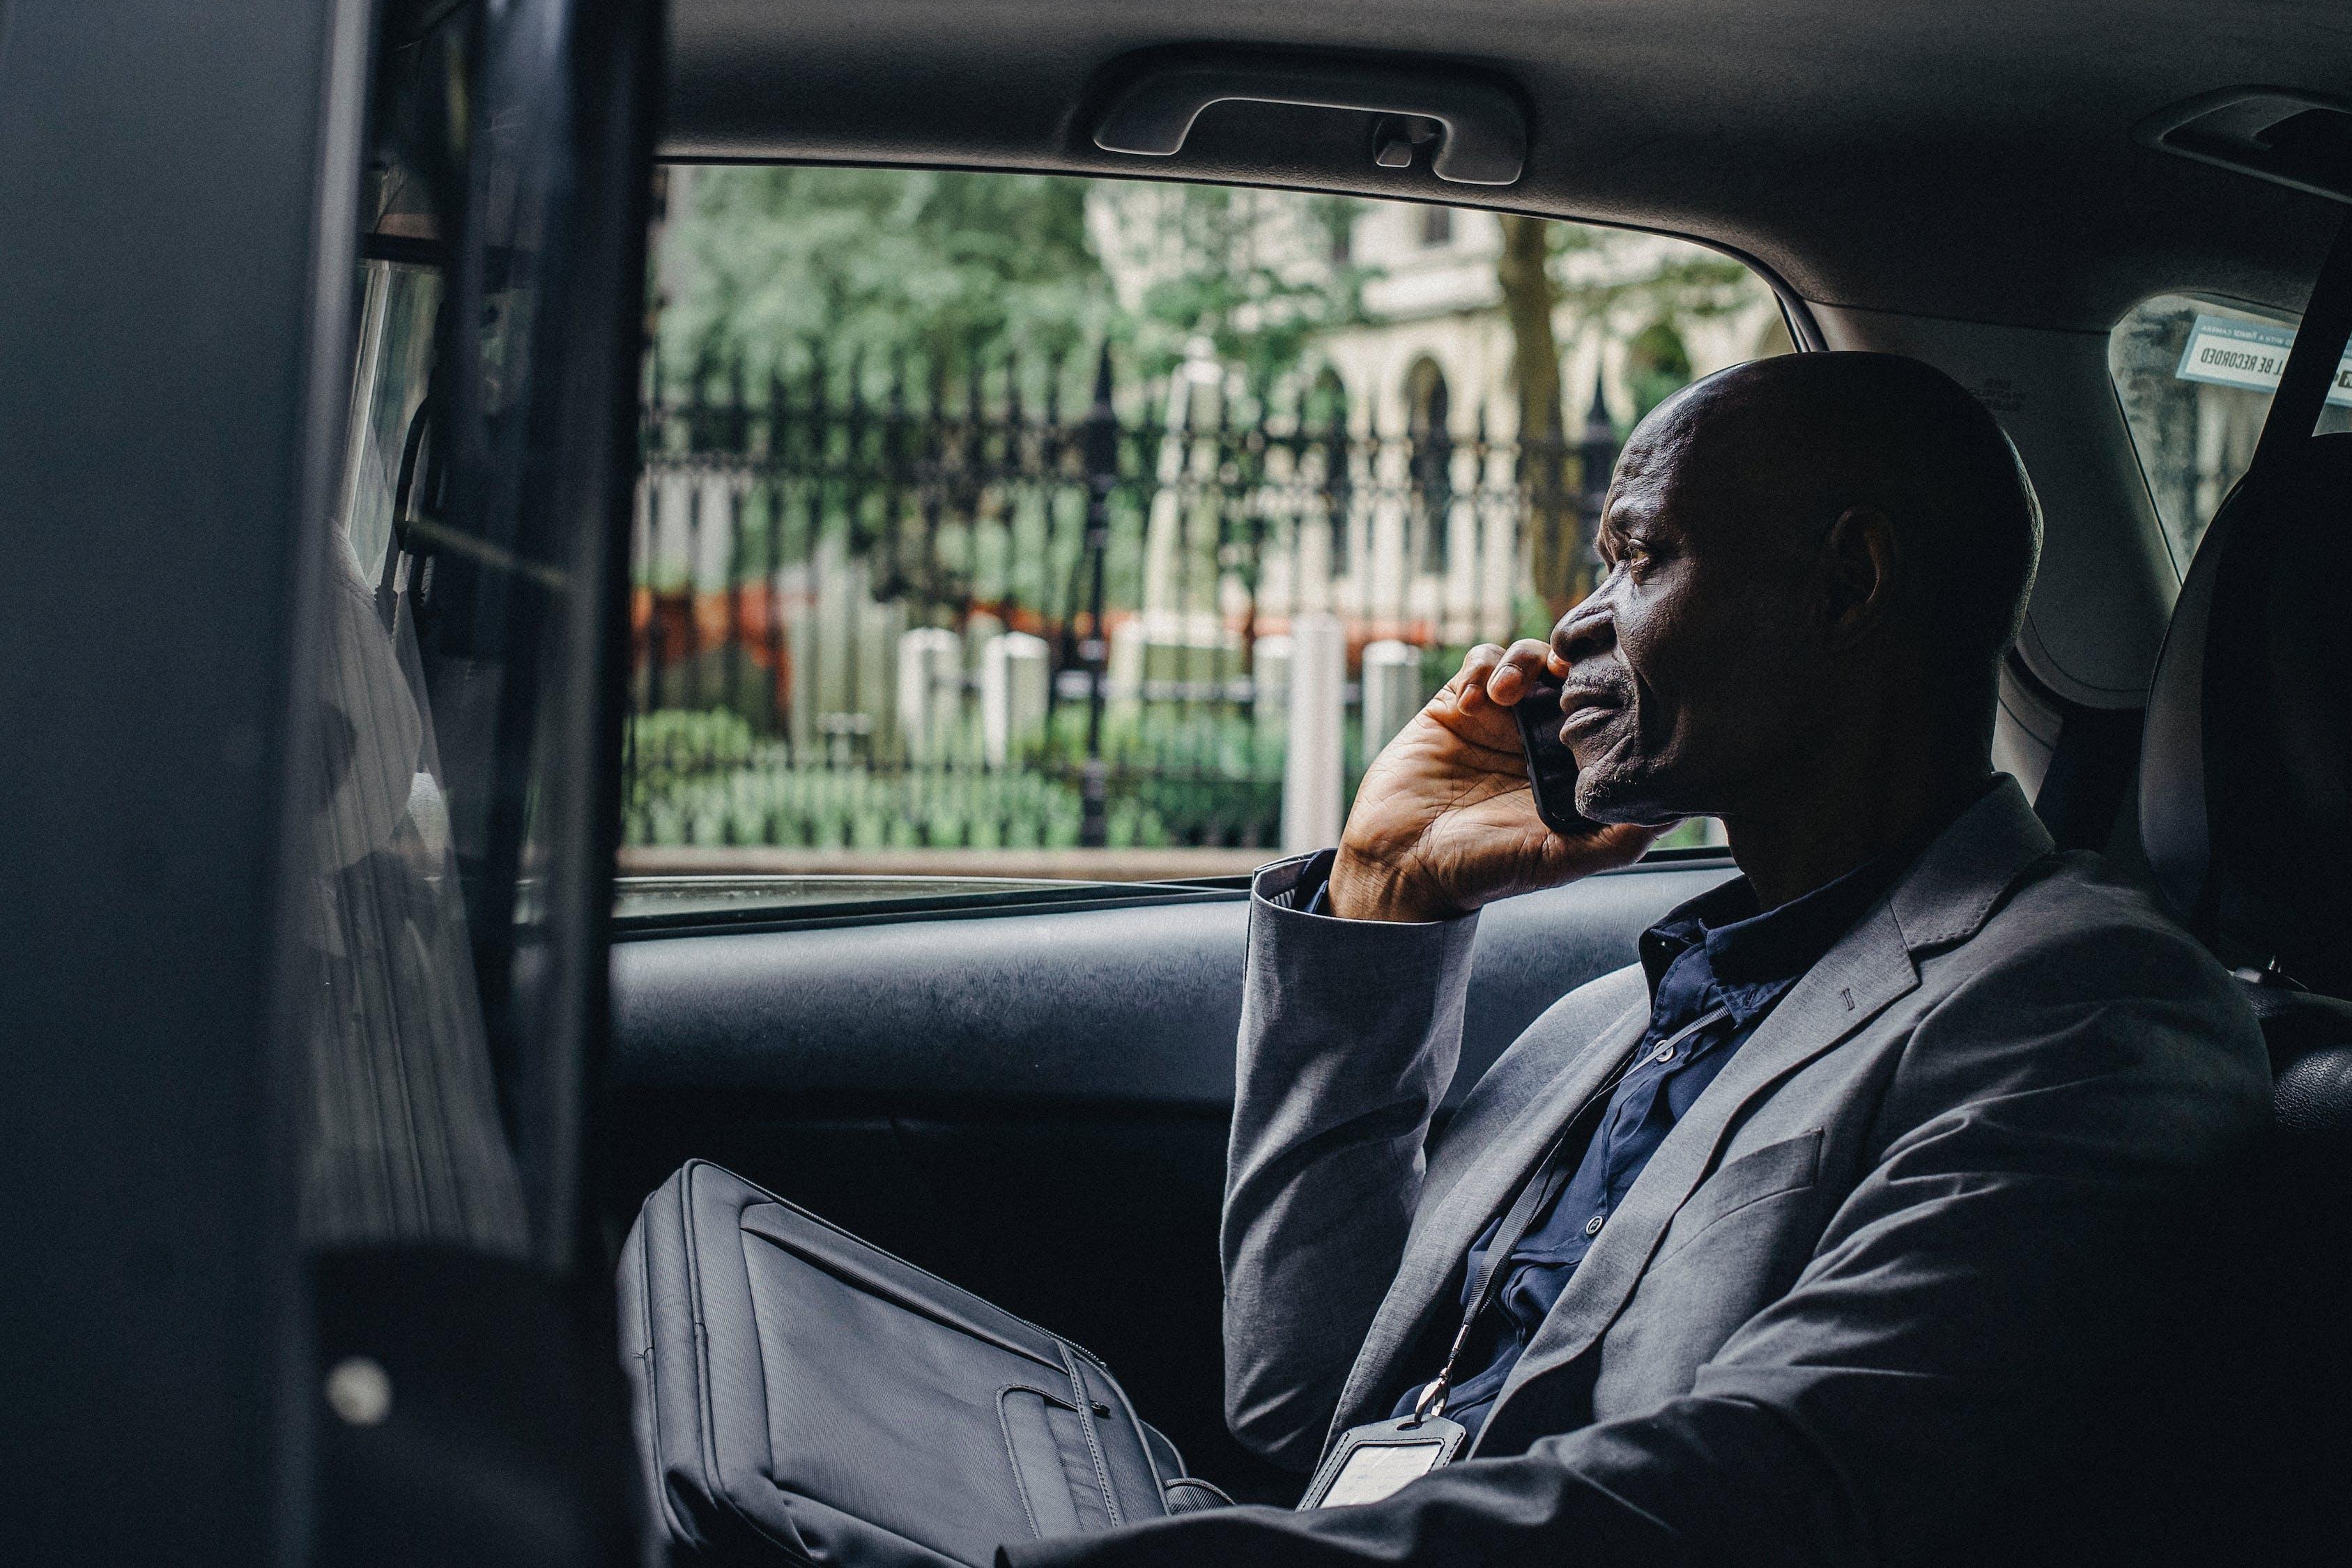 Pensive black man speaking on smartphone while sitting in car